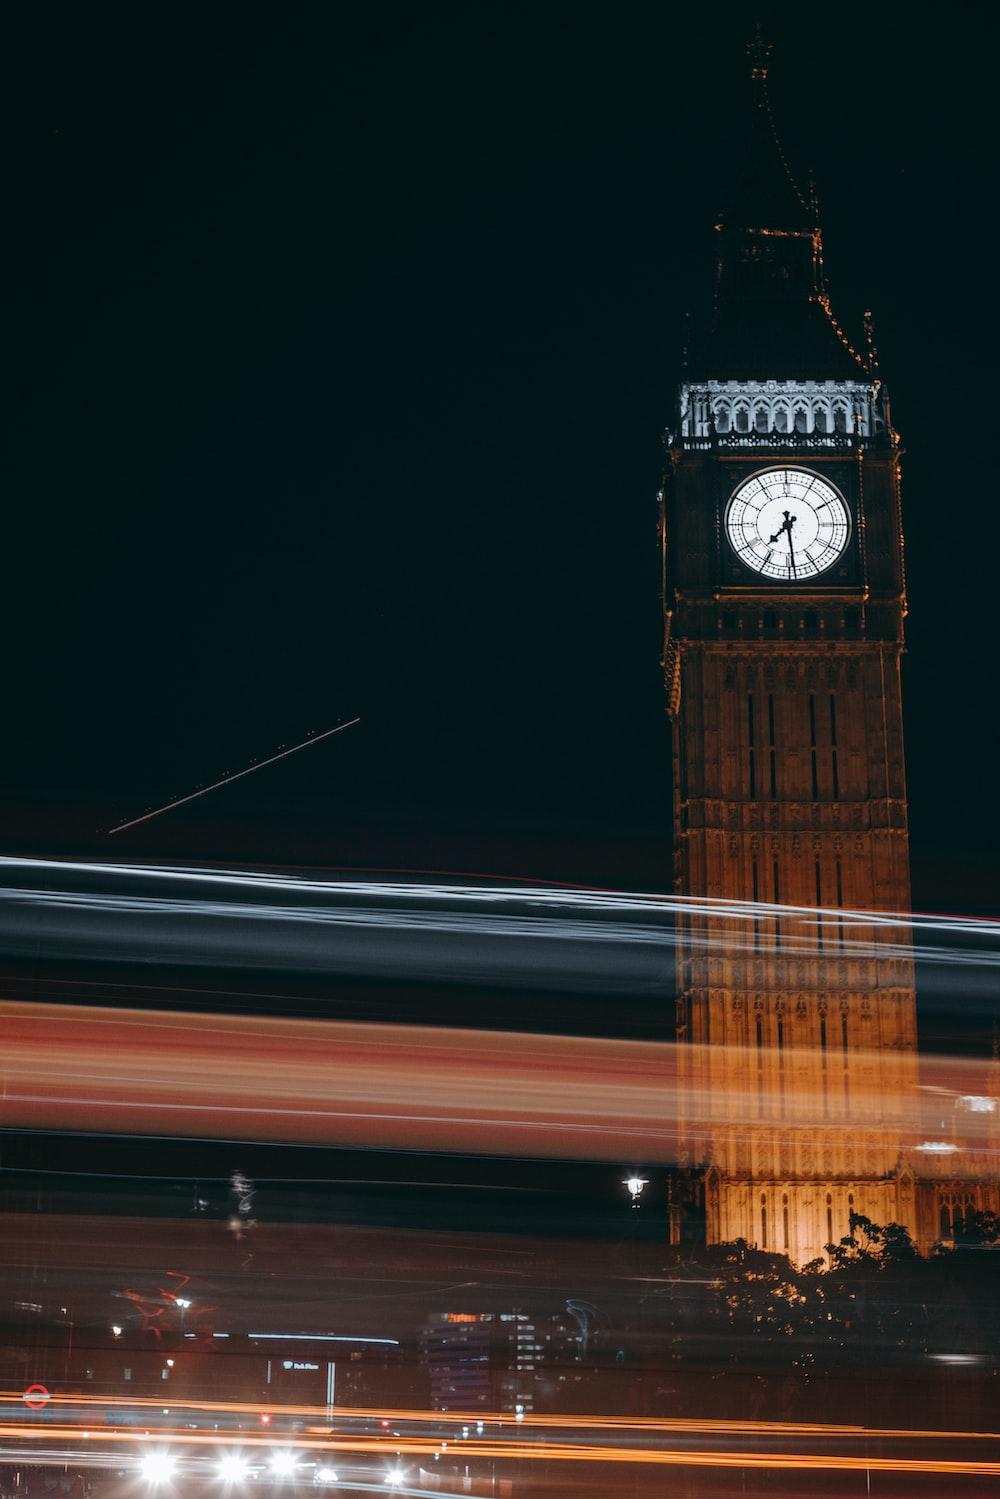 timelapse photography of Elizabeth Tower, London